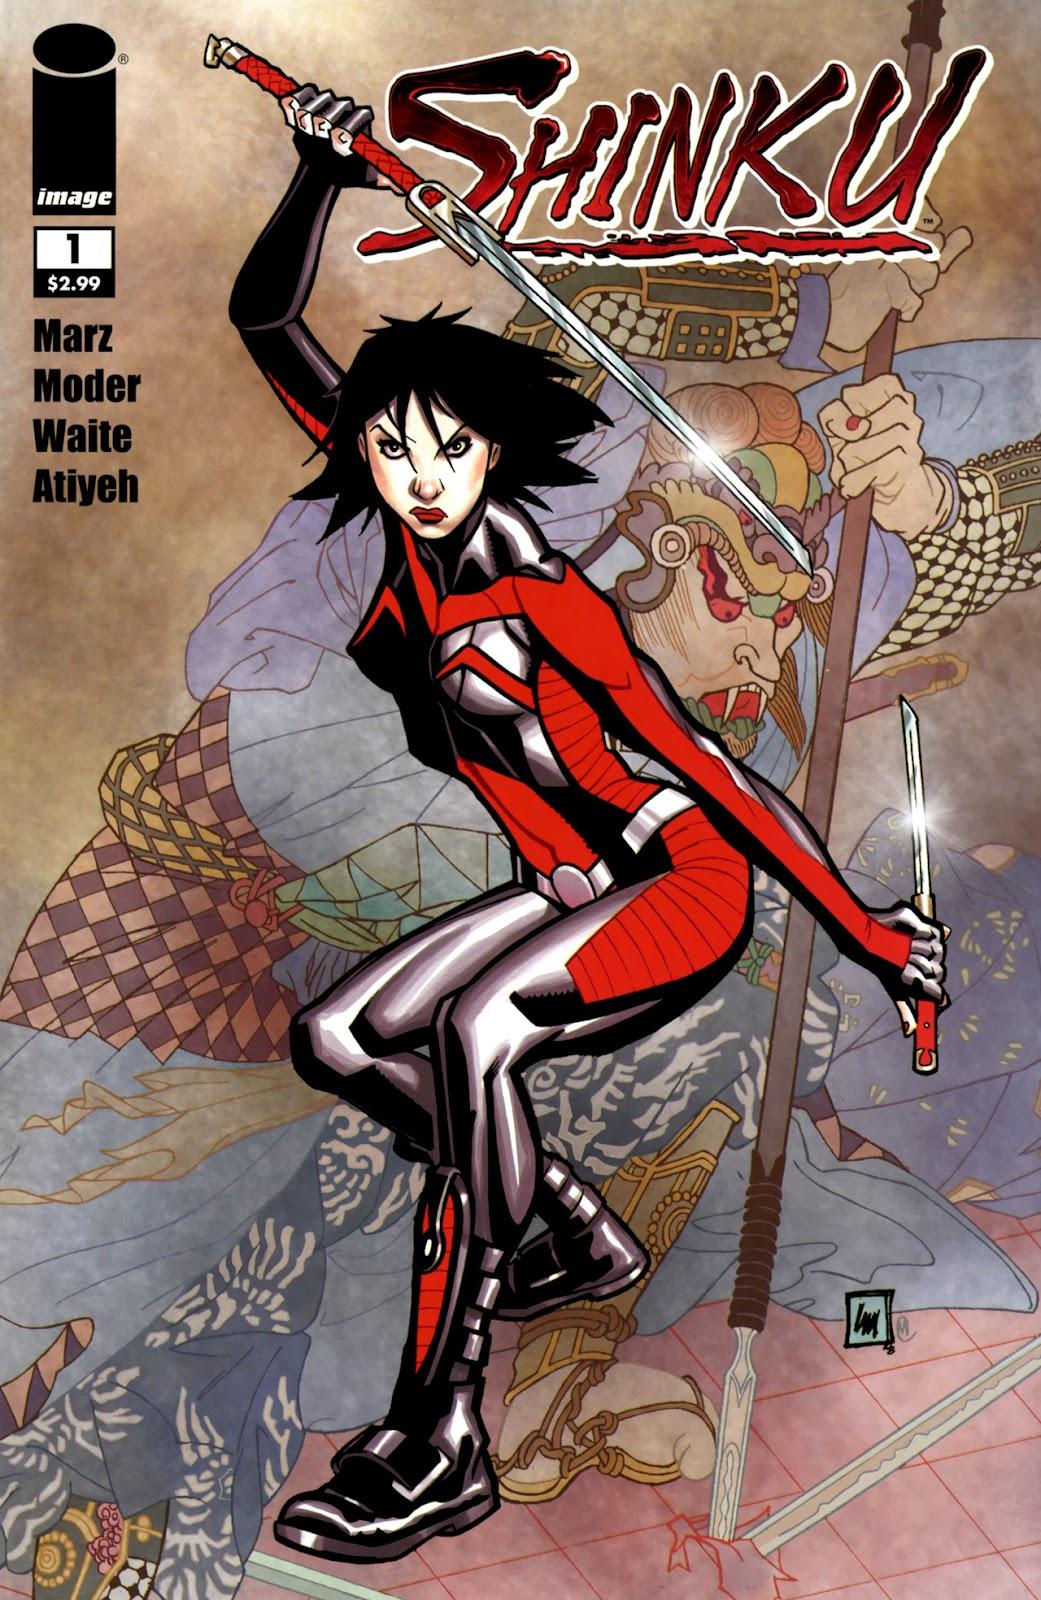 Read online Shinku comic -  Issue #1 - 1